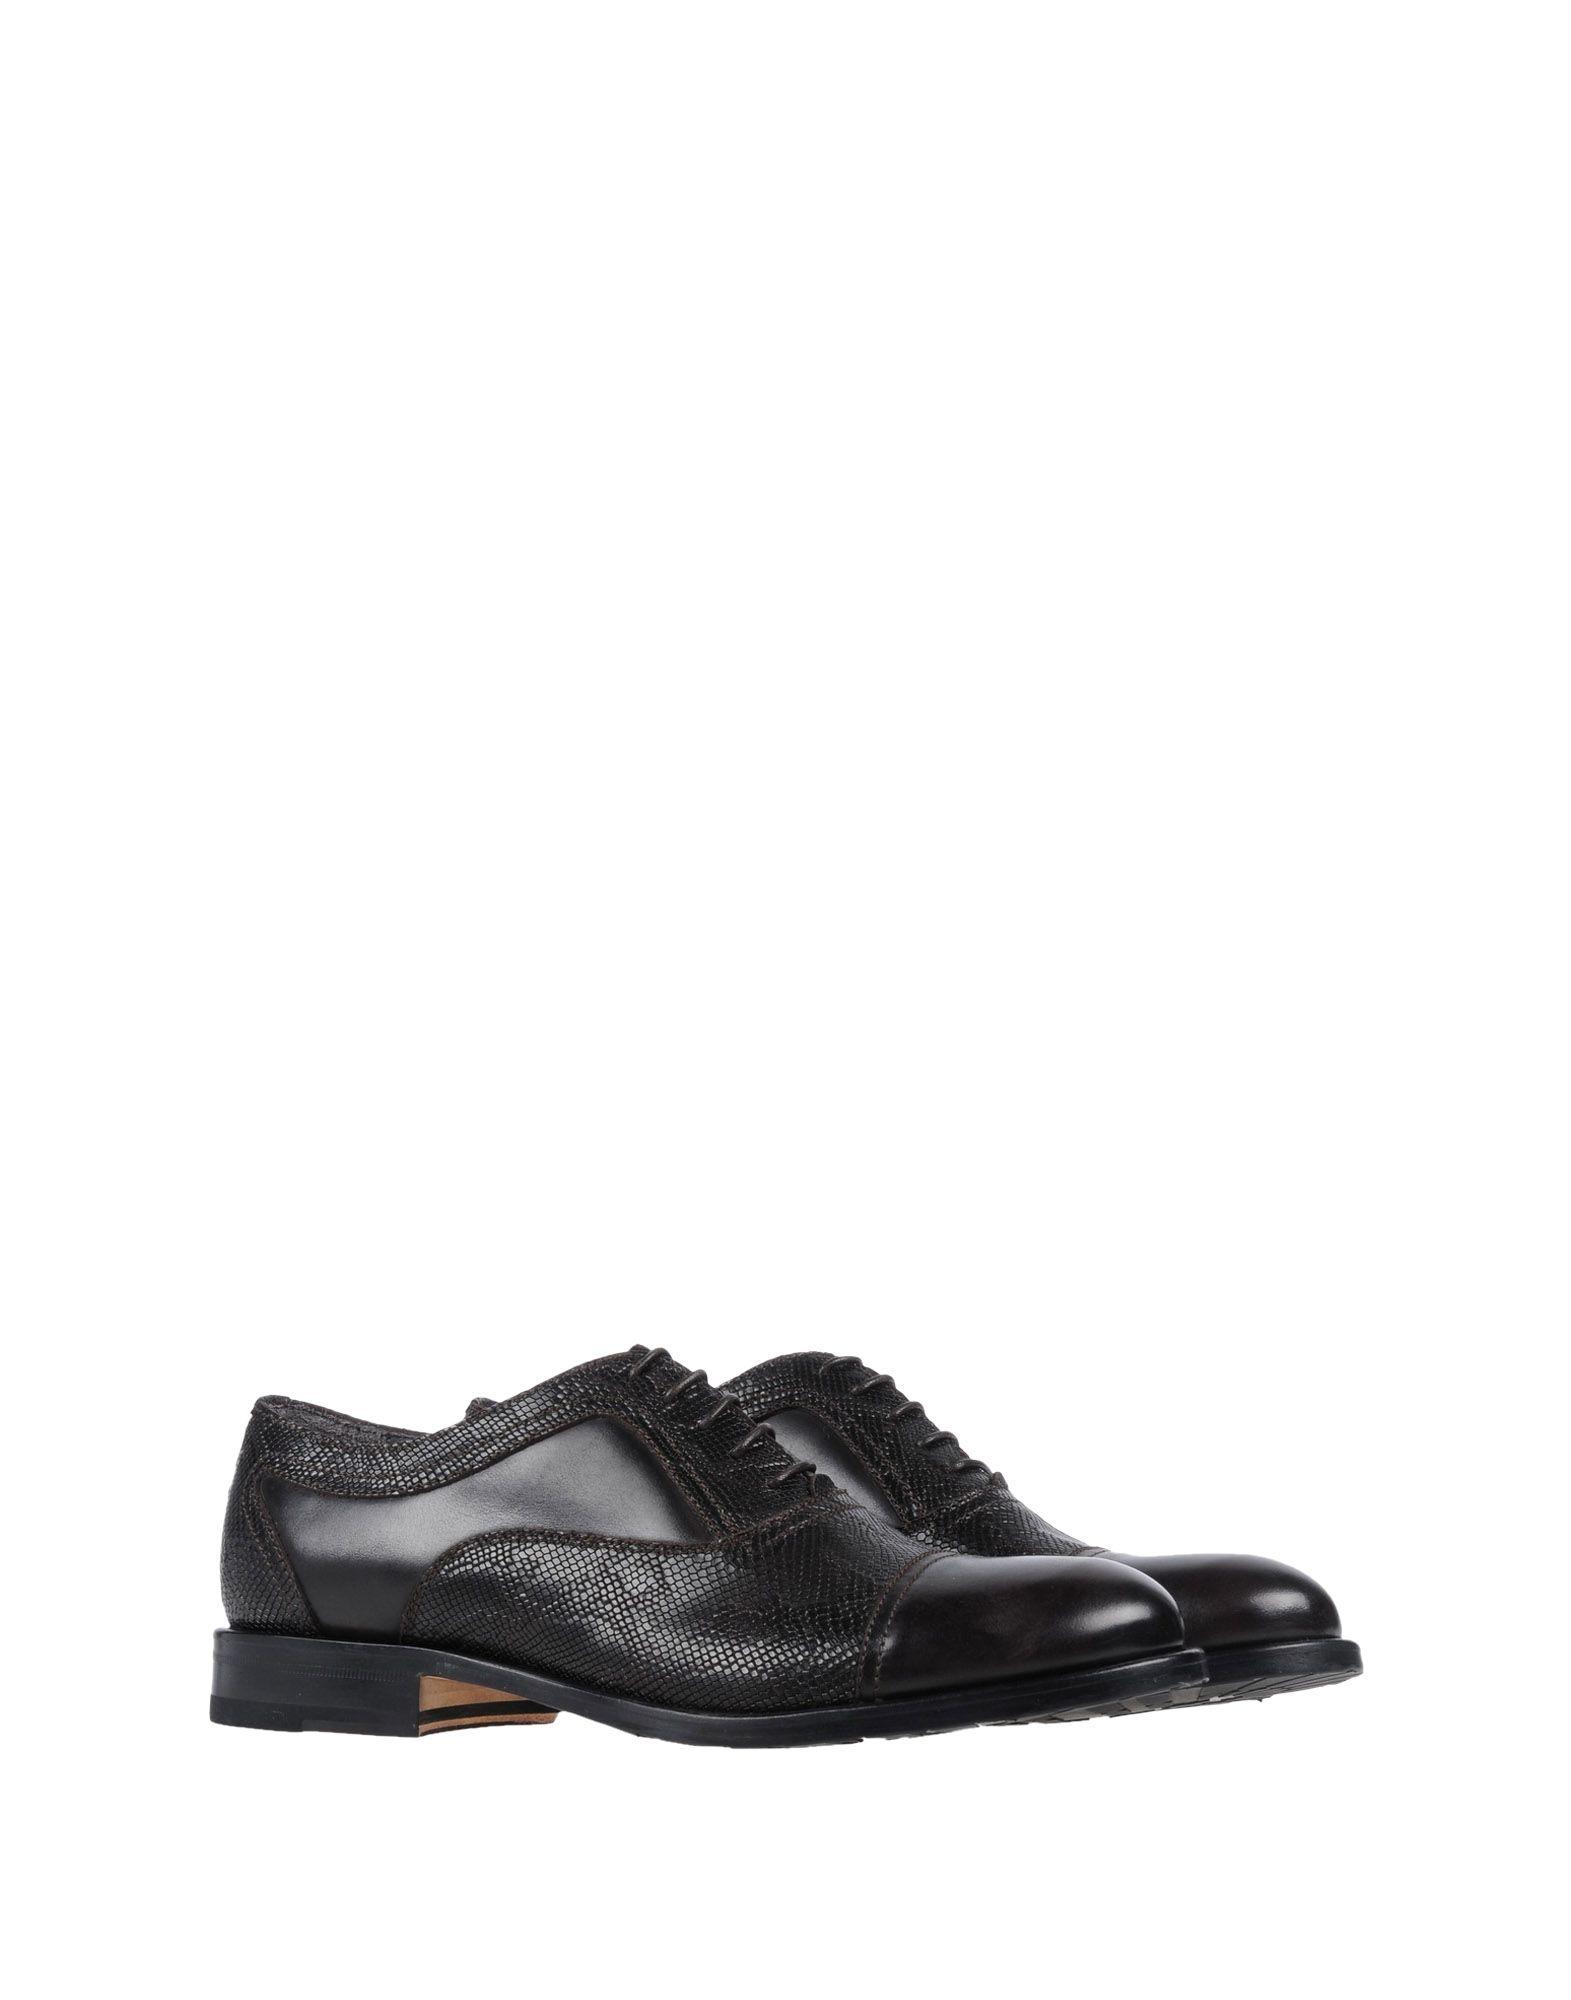 Pollini Schnürschuhe Schuhe Herren  11447642VS Heiße Schuhe Schnürschuhe 2db64b